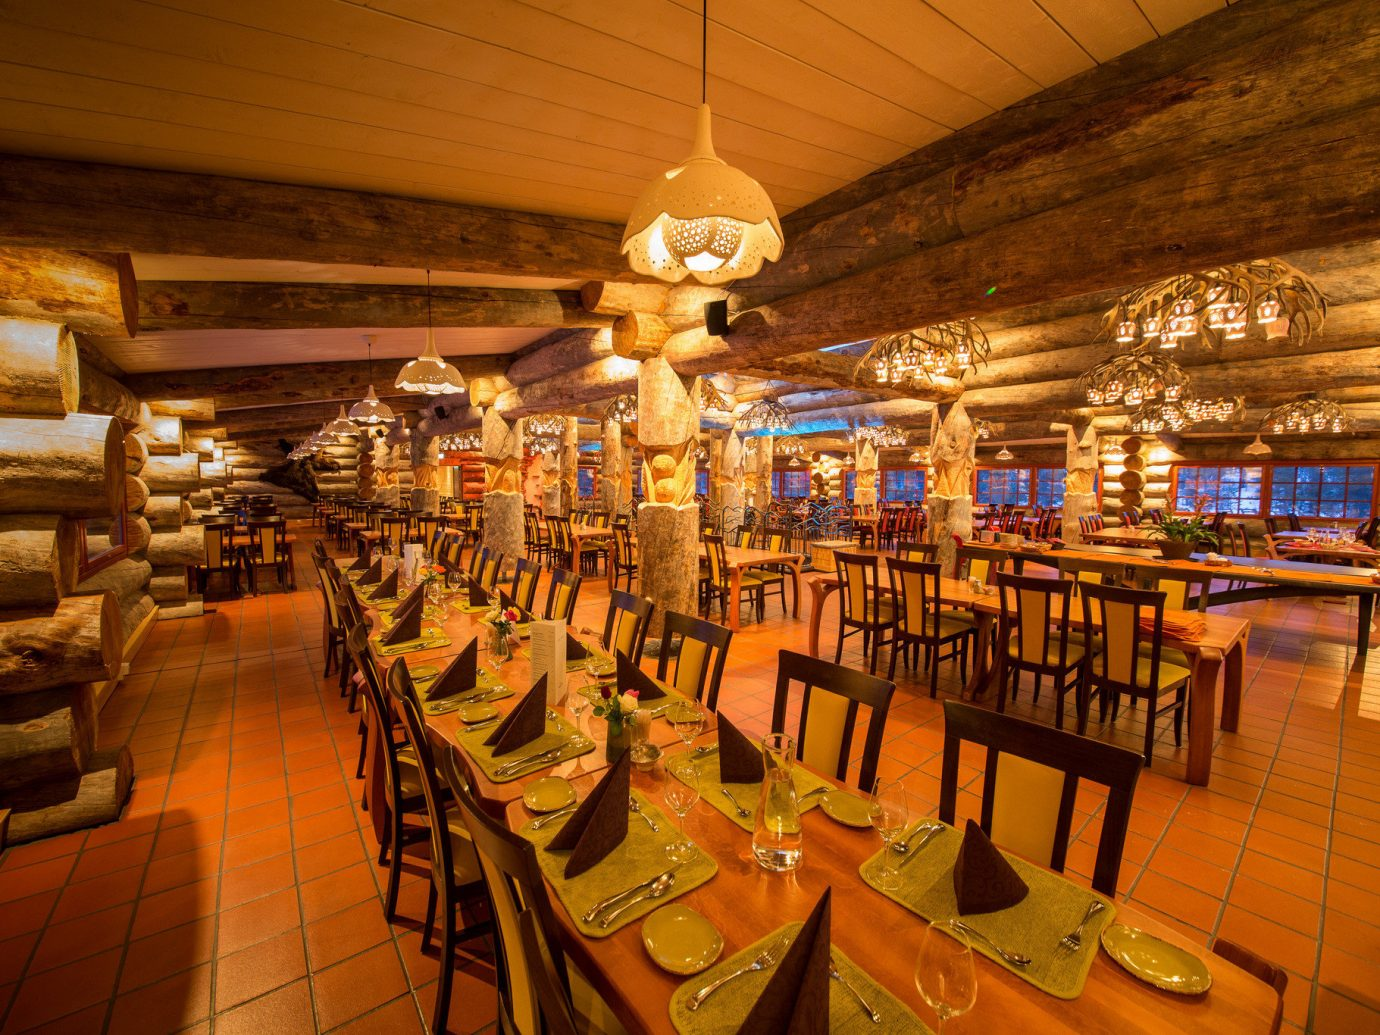 Hotels Offbeat indoor floor ceiling chair restaurant tavern function hall interior design Bar several furniture